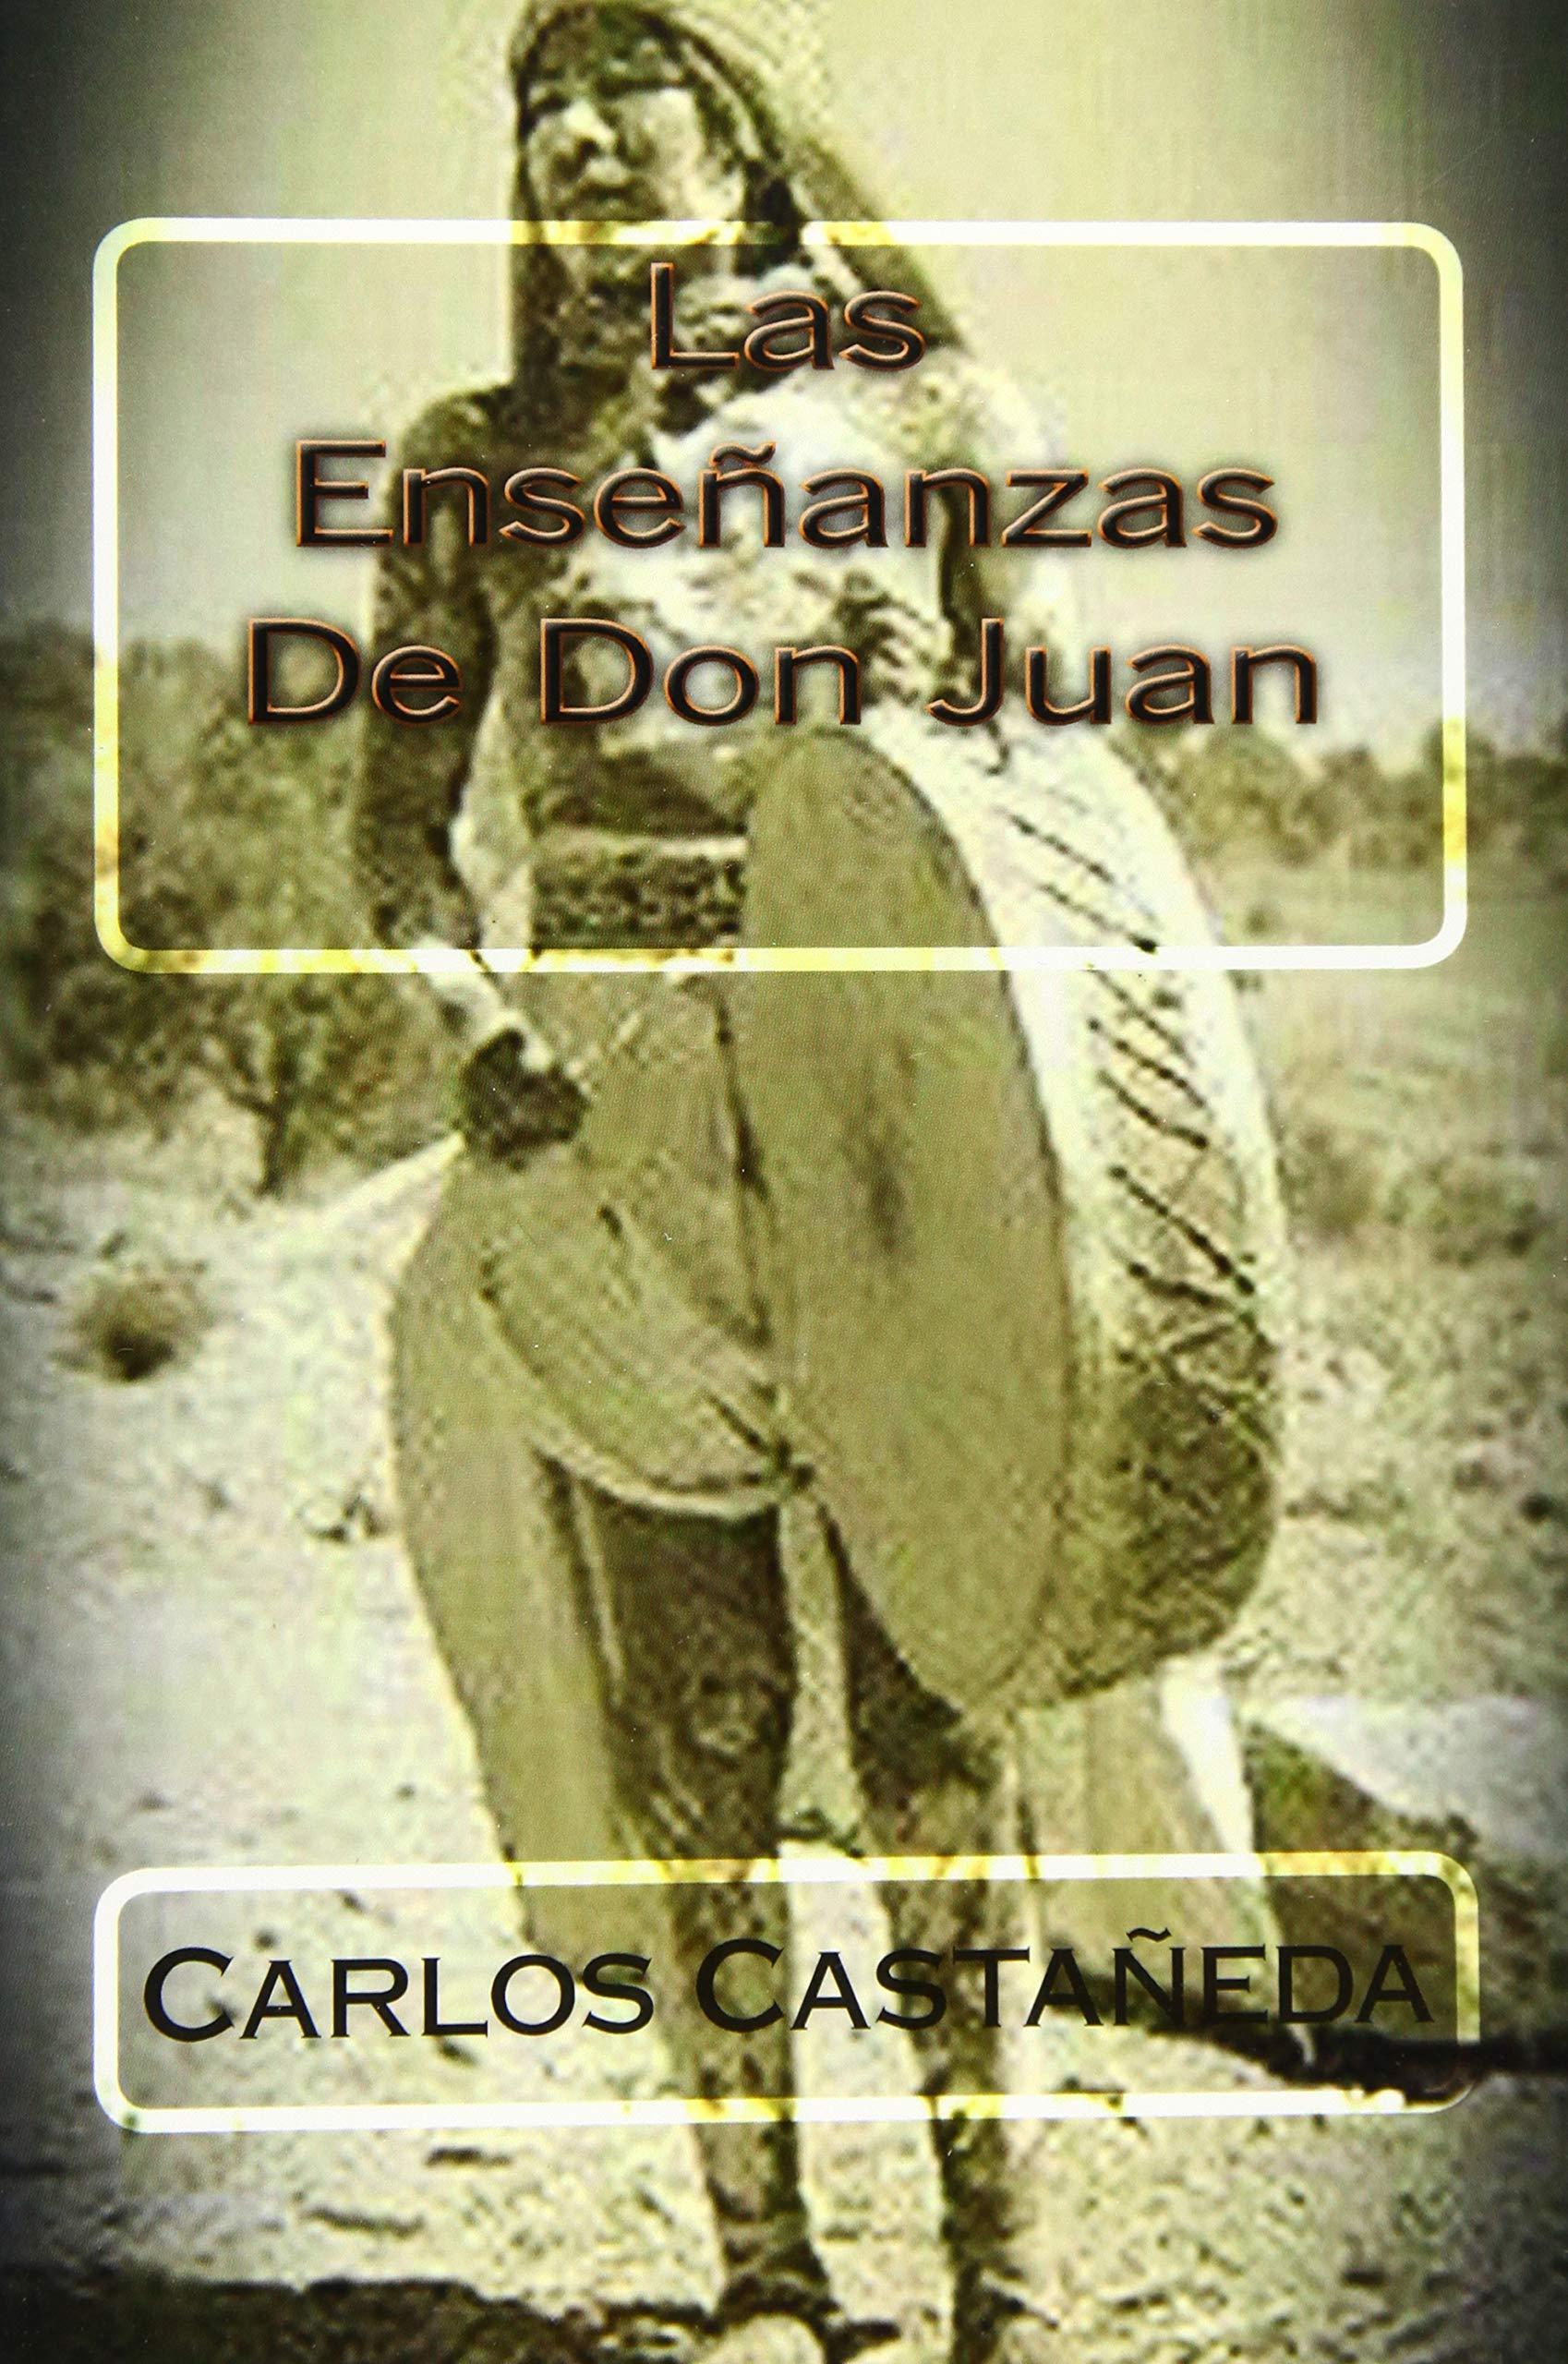 Las Ensenanzas De Don Juan Amazon Co Uk Castaneda Carlos Hernandez B Martin 9781514260630 Books